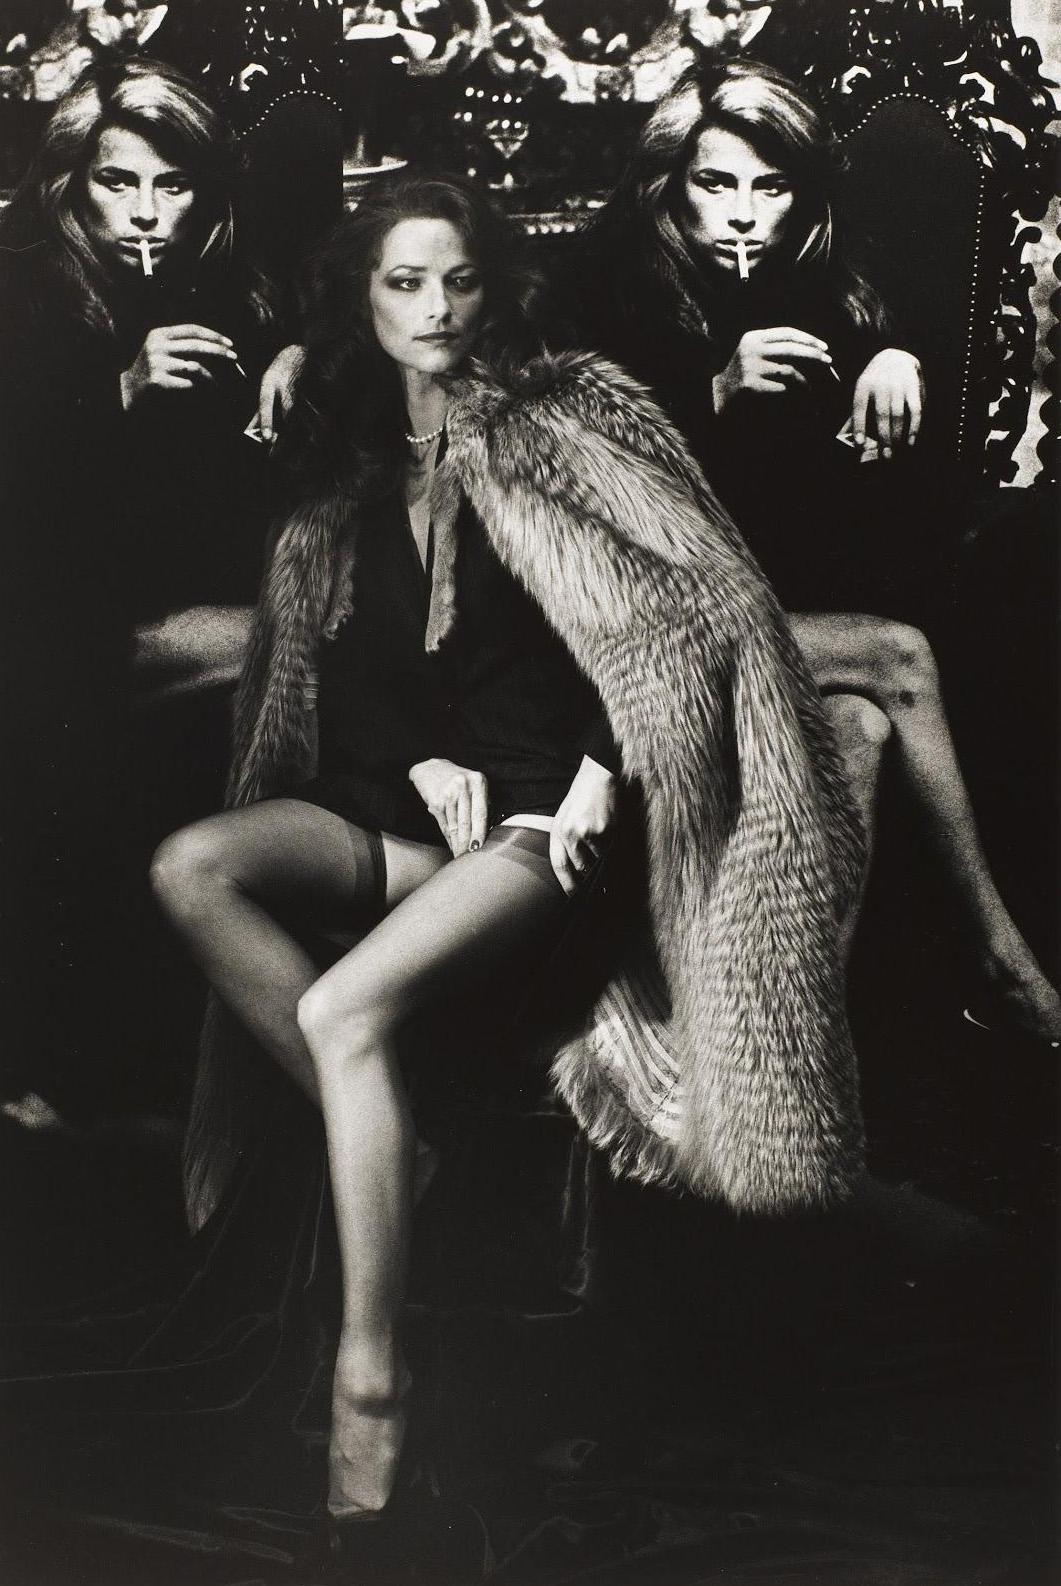 charlotte-rampling-paris-1982-c2a9-helmut-newton.jpeg